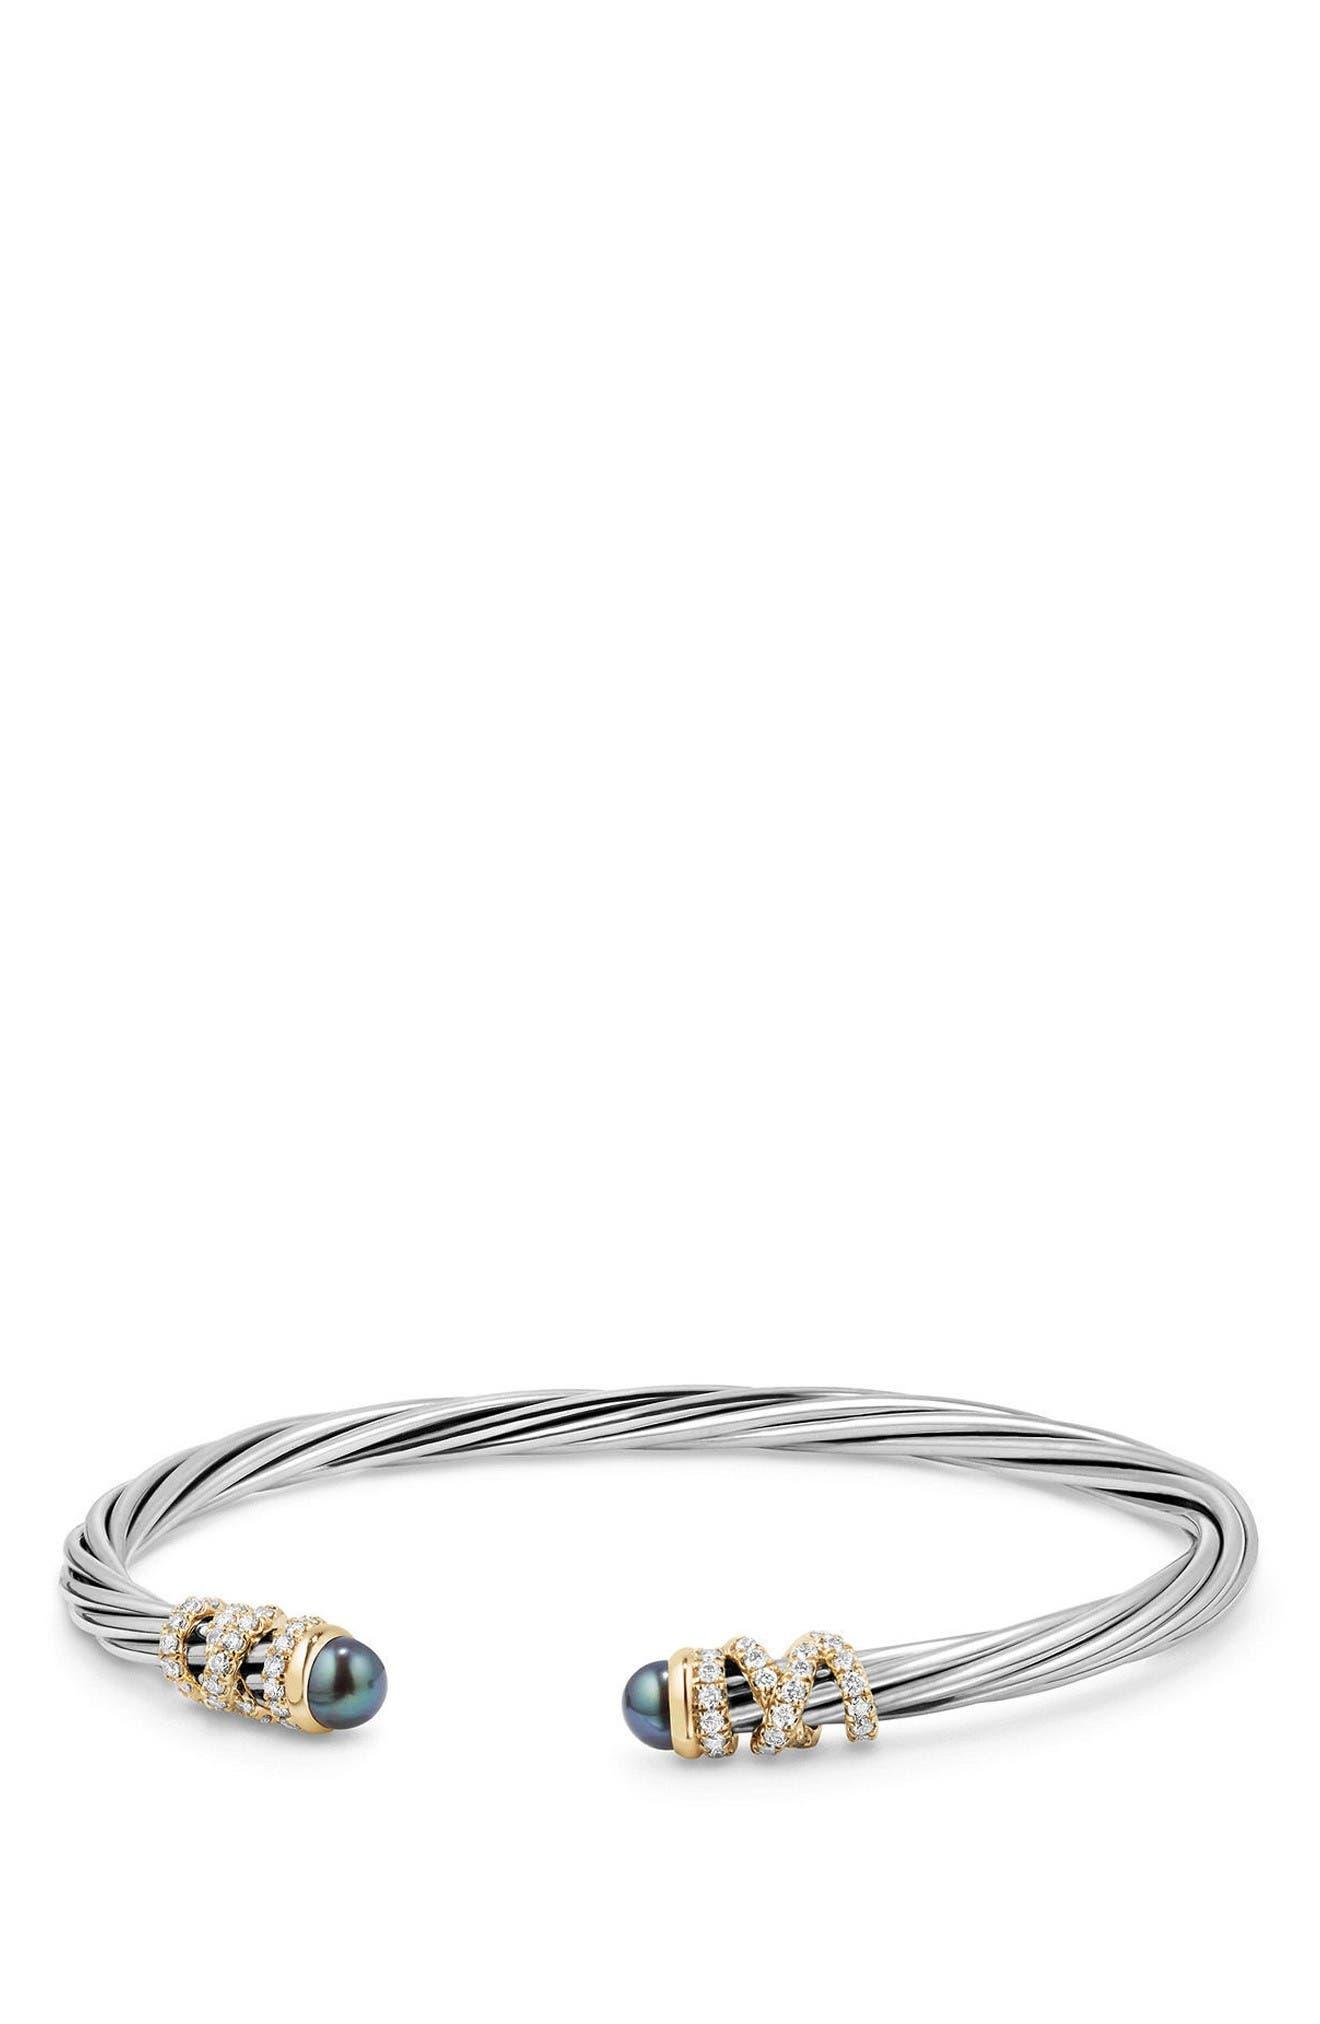 DAVID YURMAN Helena End Station Bracelet with Pearls